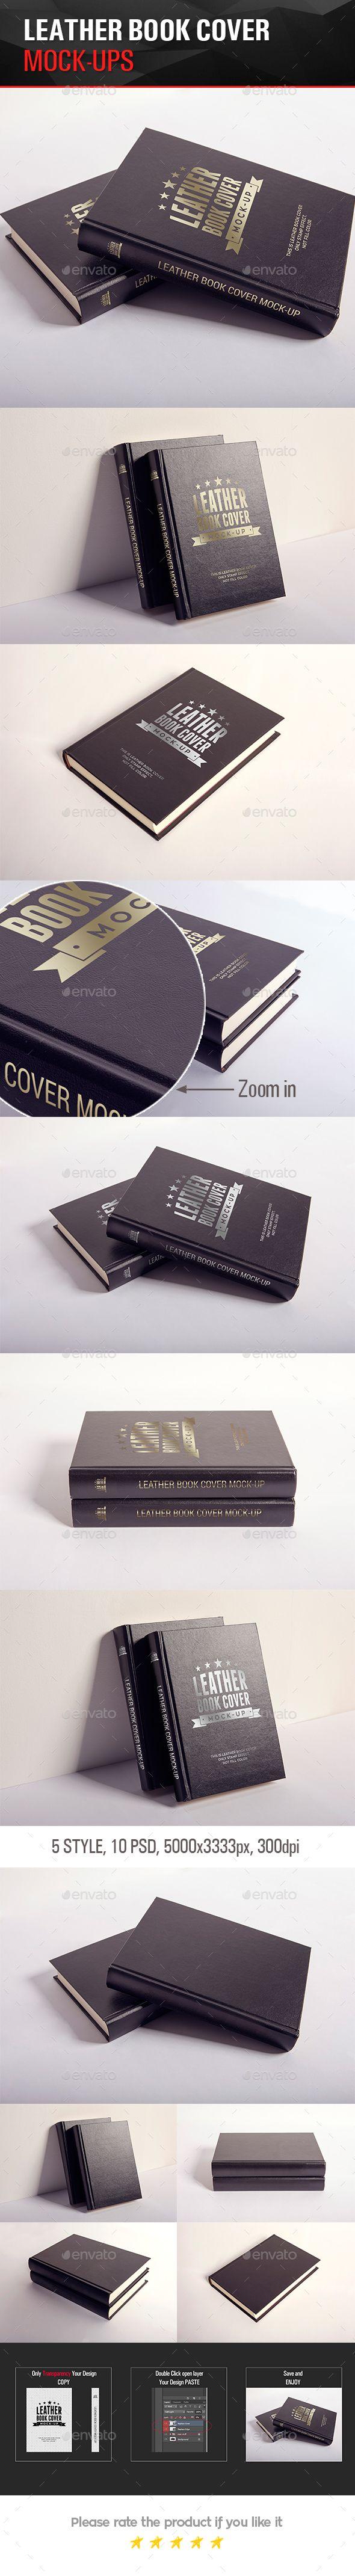 Leather Book Hard Cover Mock-Up #design Download: http://graphicriver.net/item/leather-book-cover-mockup/14144460?ref=ksioks